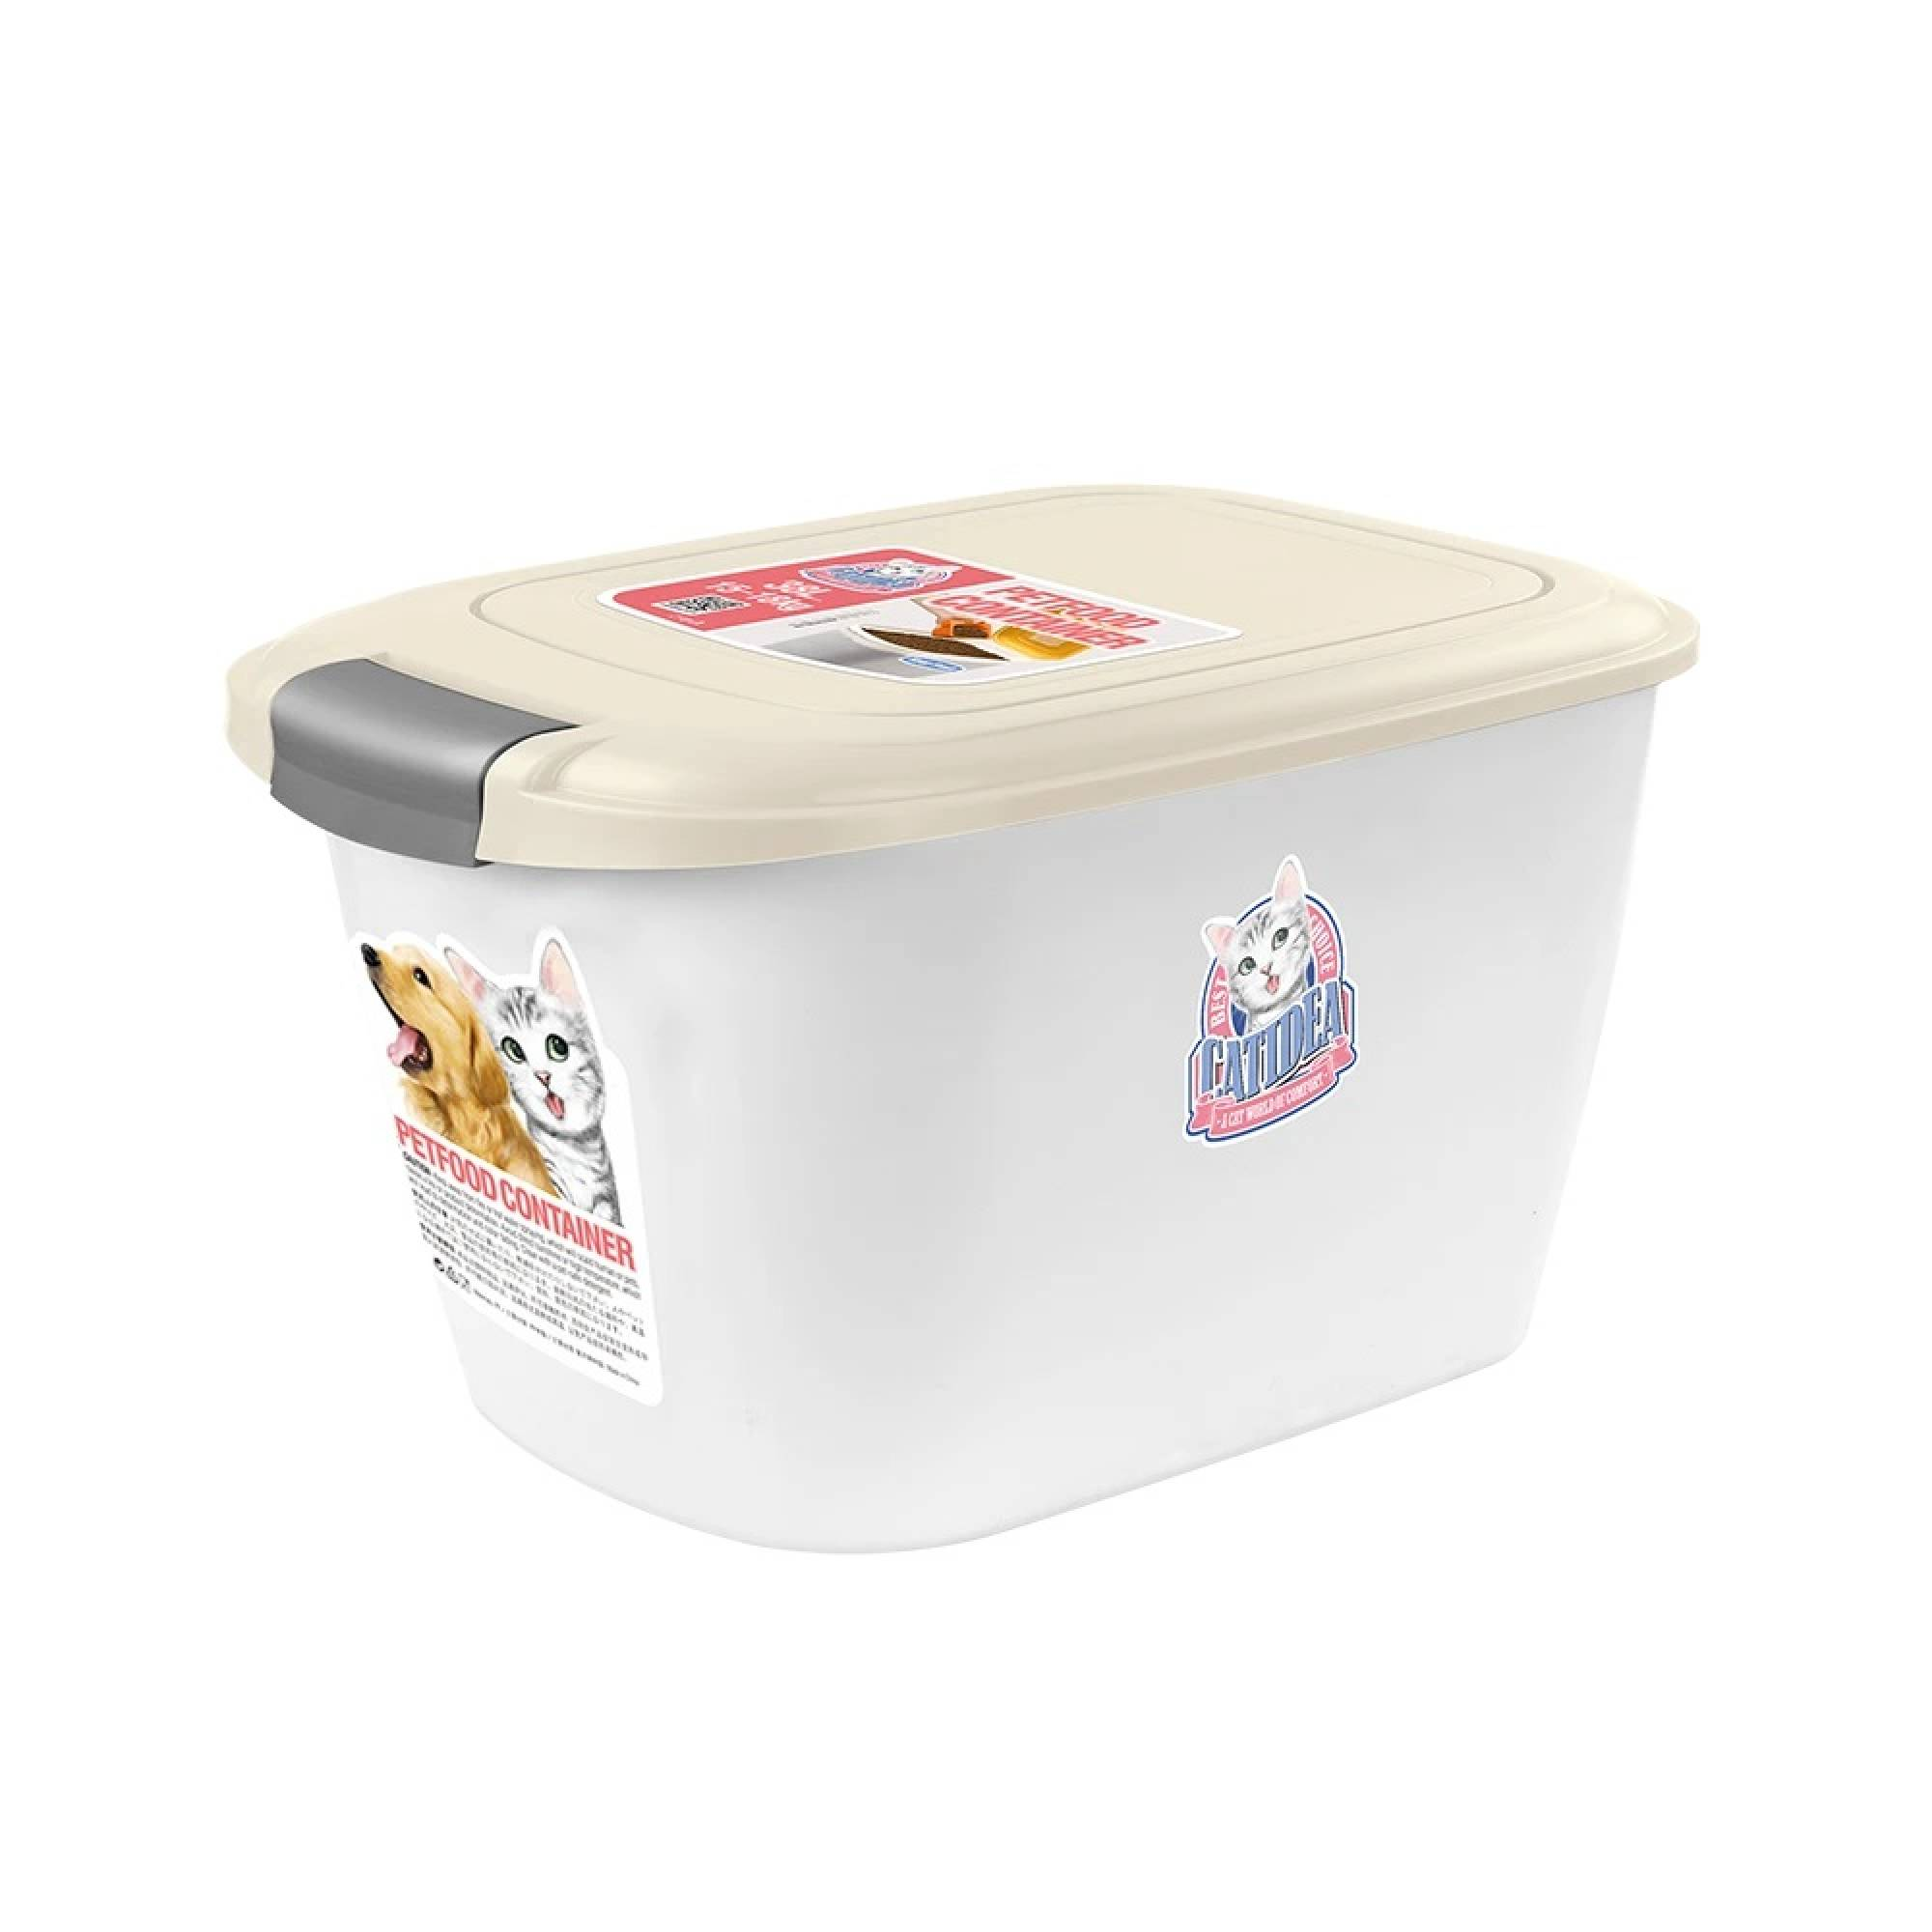 CATIDEA - CF101 Single Open Food Container - 5kg Cream